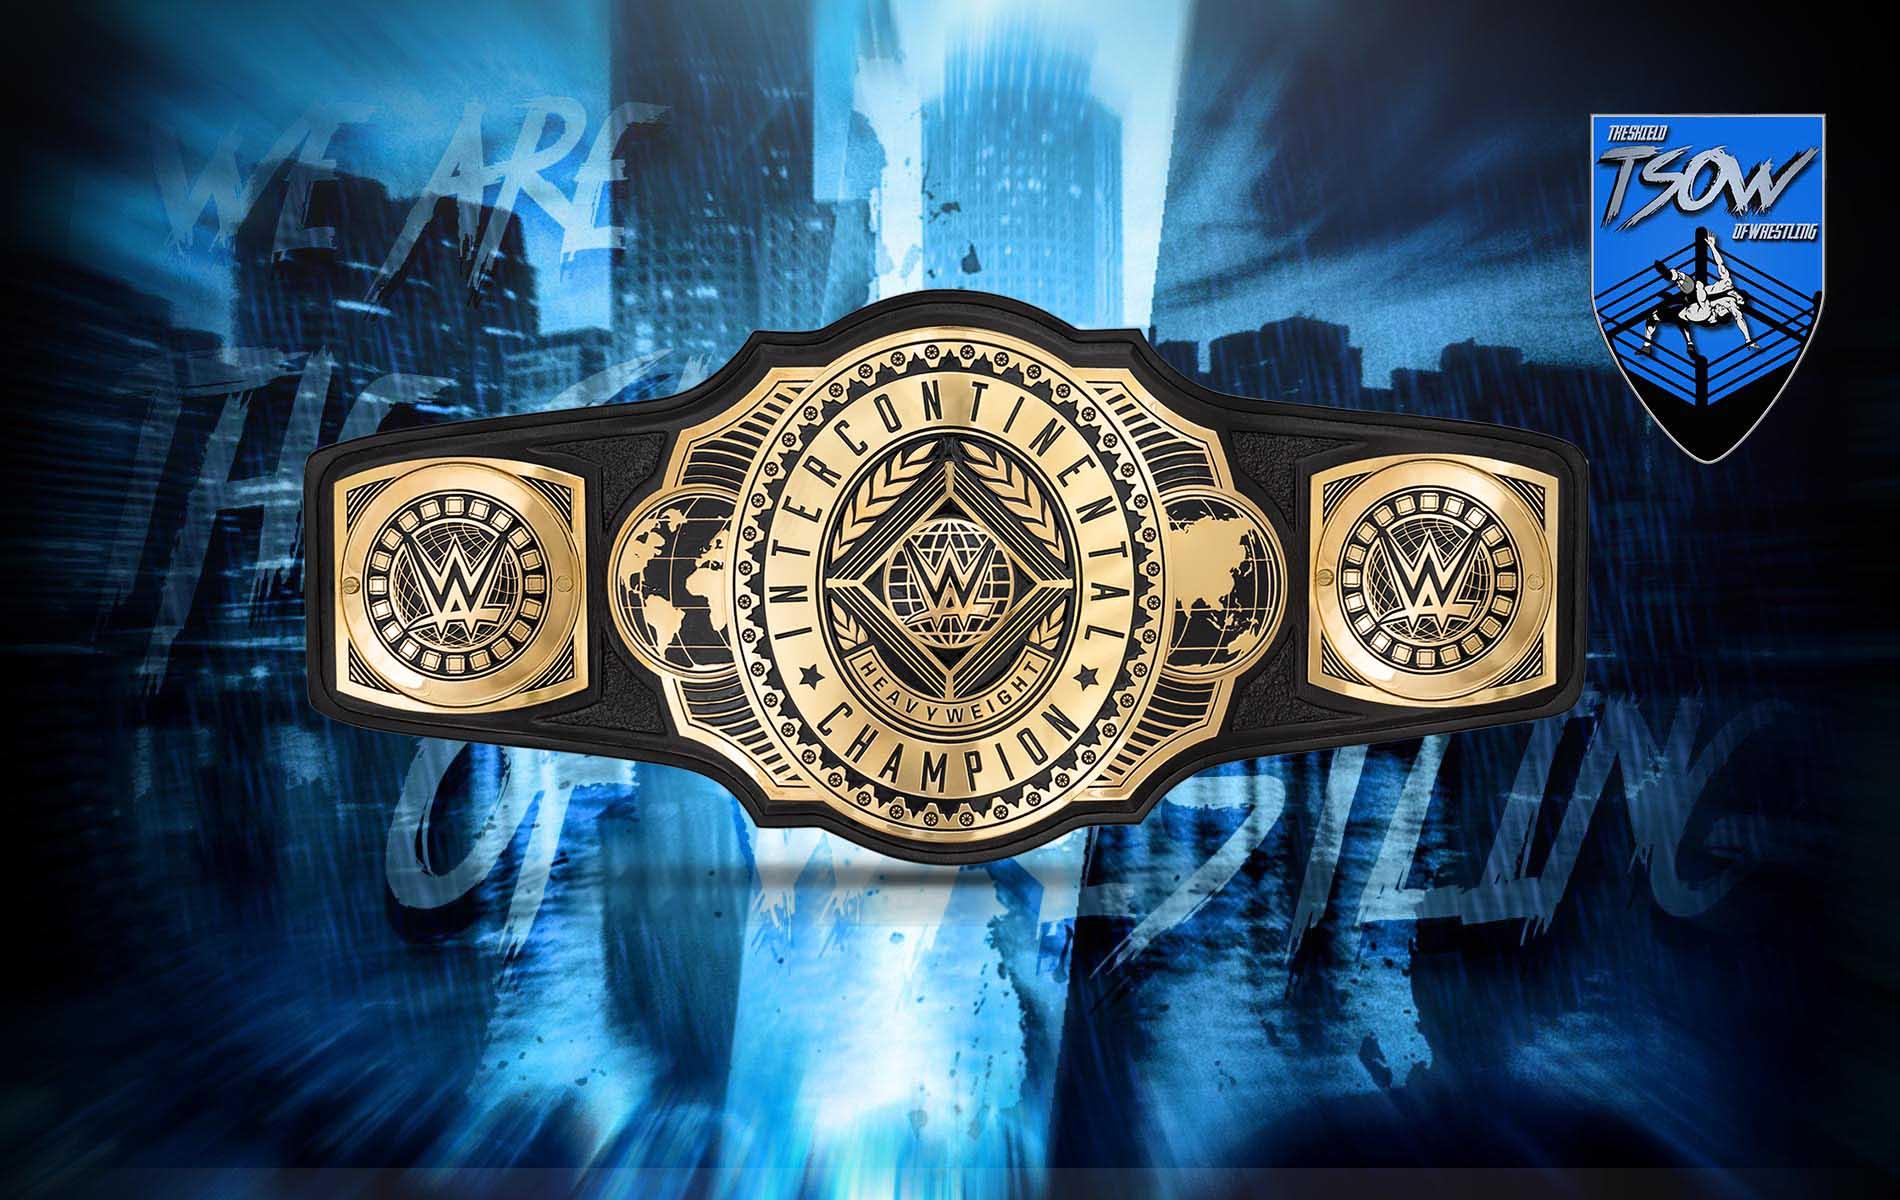 Big E vs Apollo Crews: chi ha vinto a SmackDown?